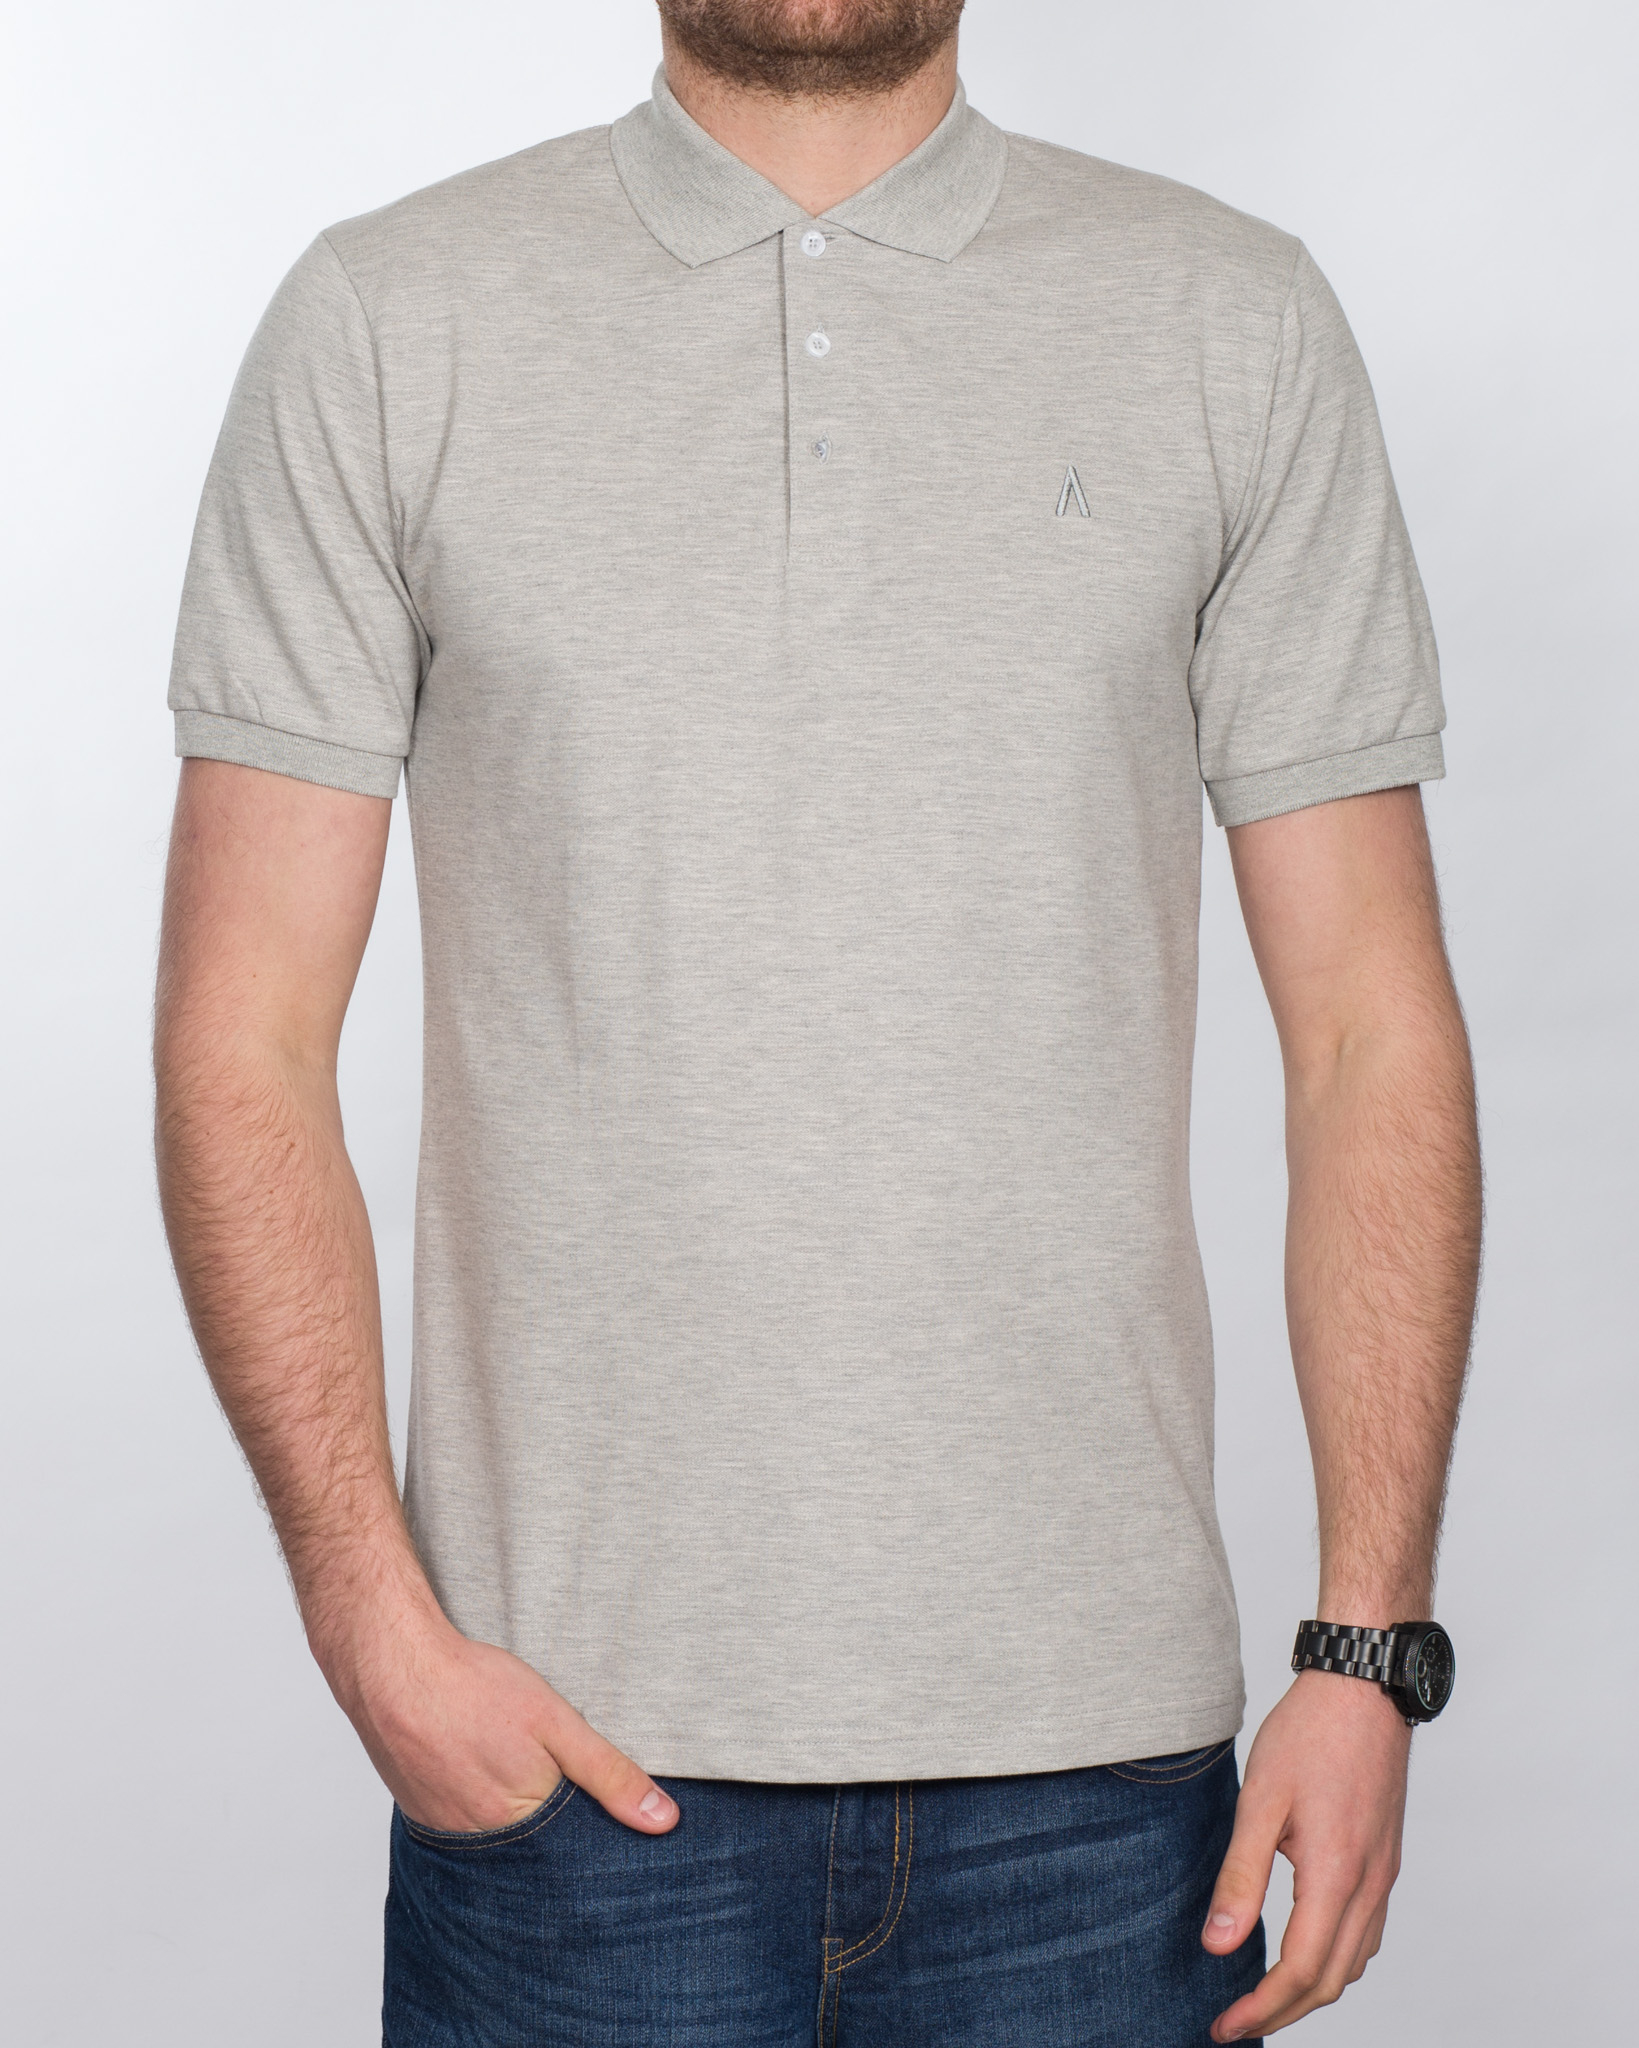 2t Slim Fit Tall Polo Shirt (heather grey)